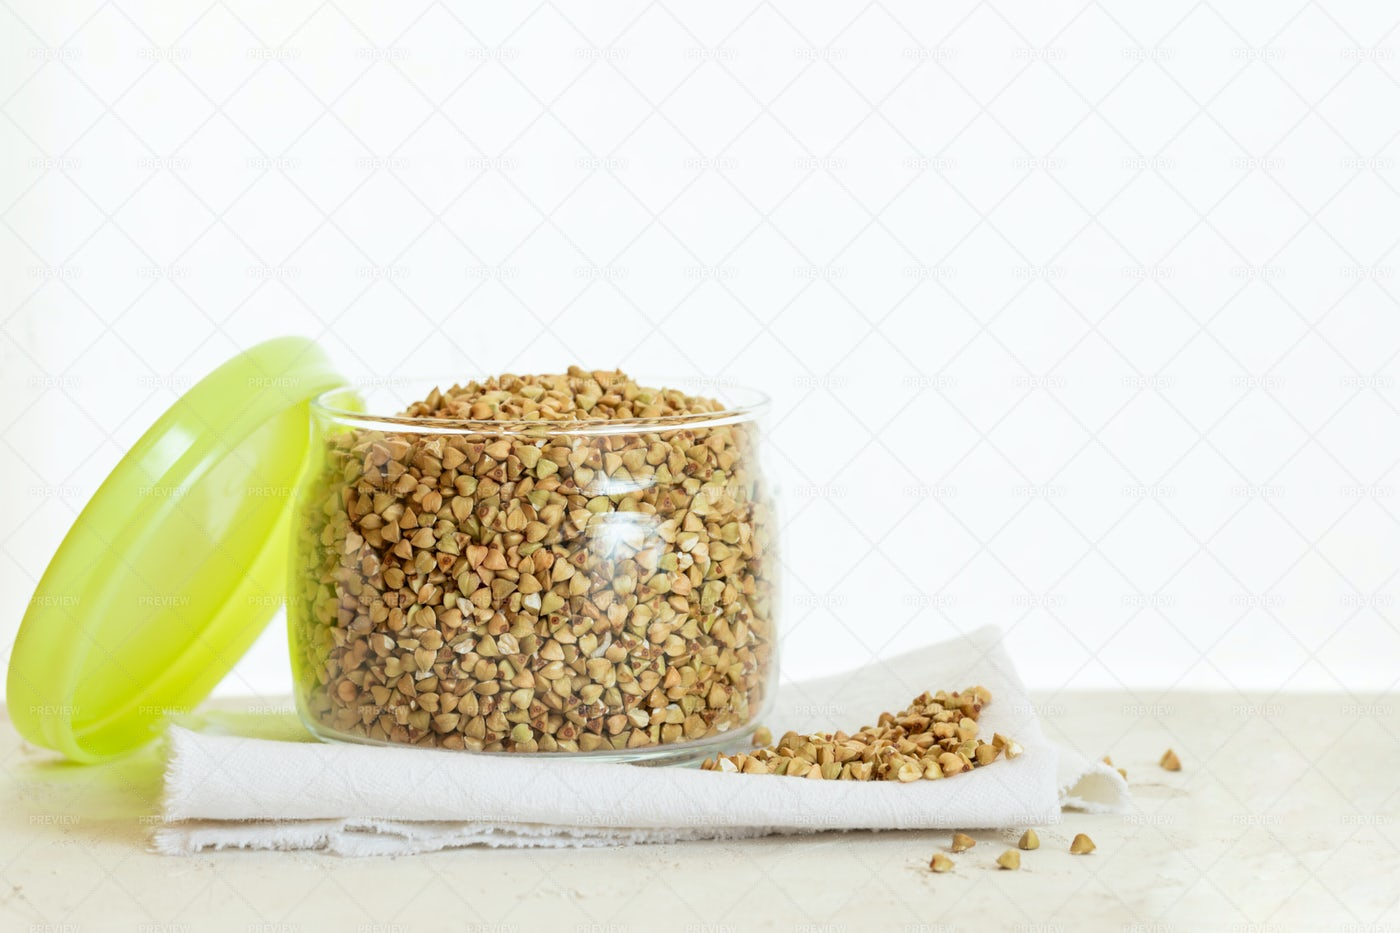 Green Buckwheat In Glass Bowl: Stock Photos